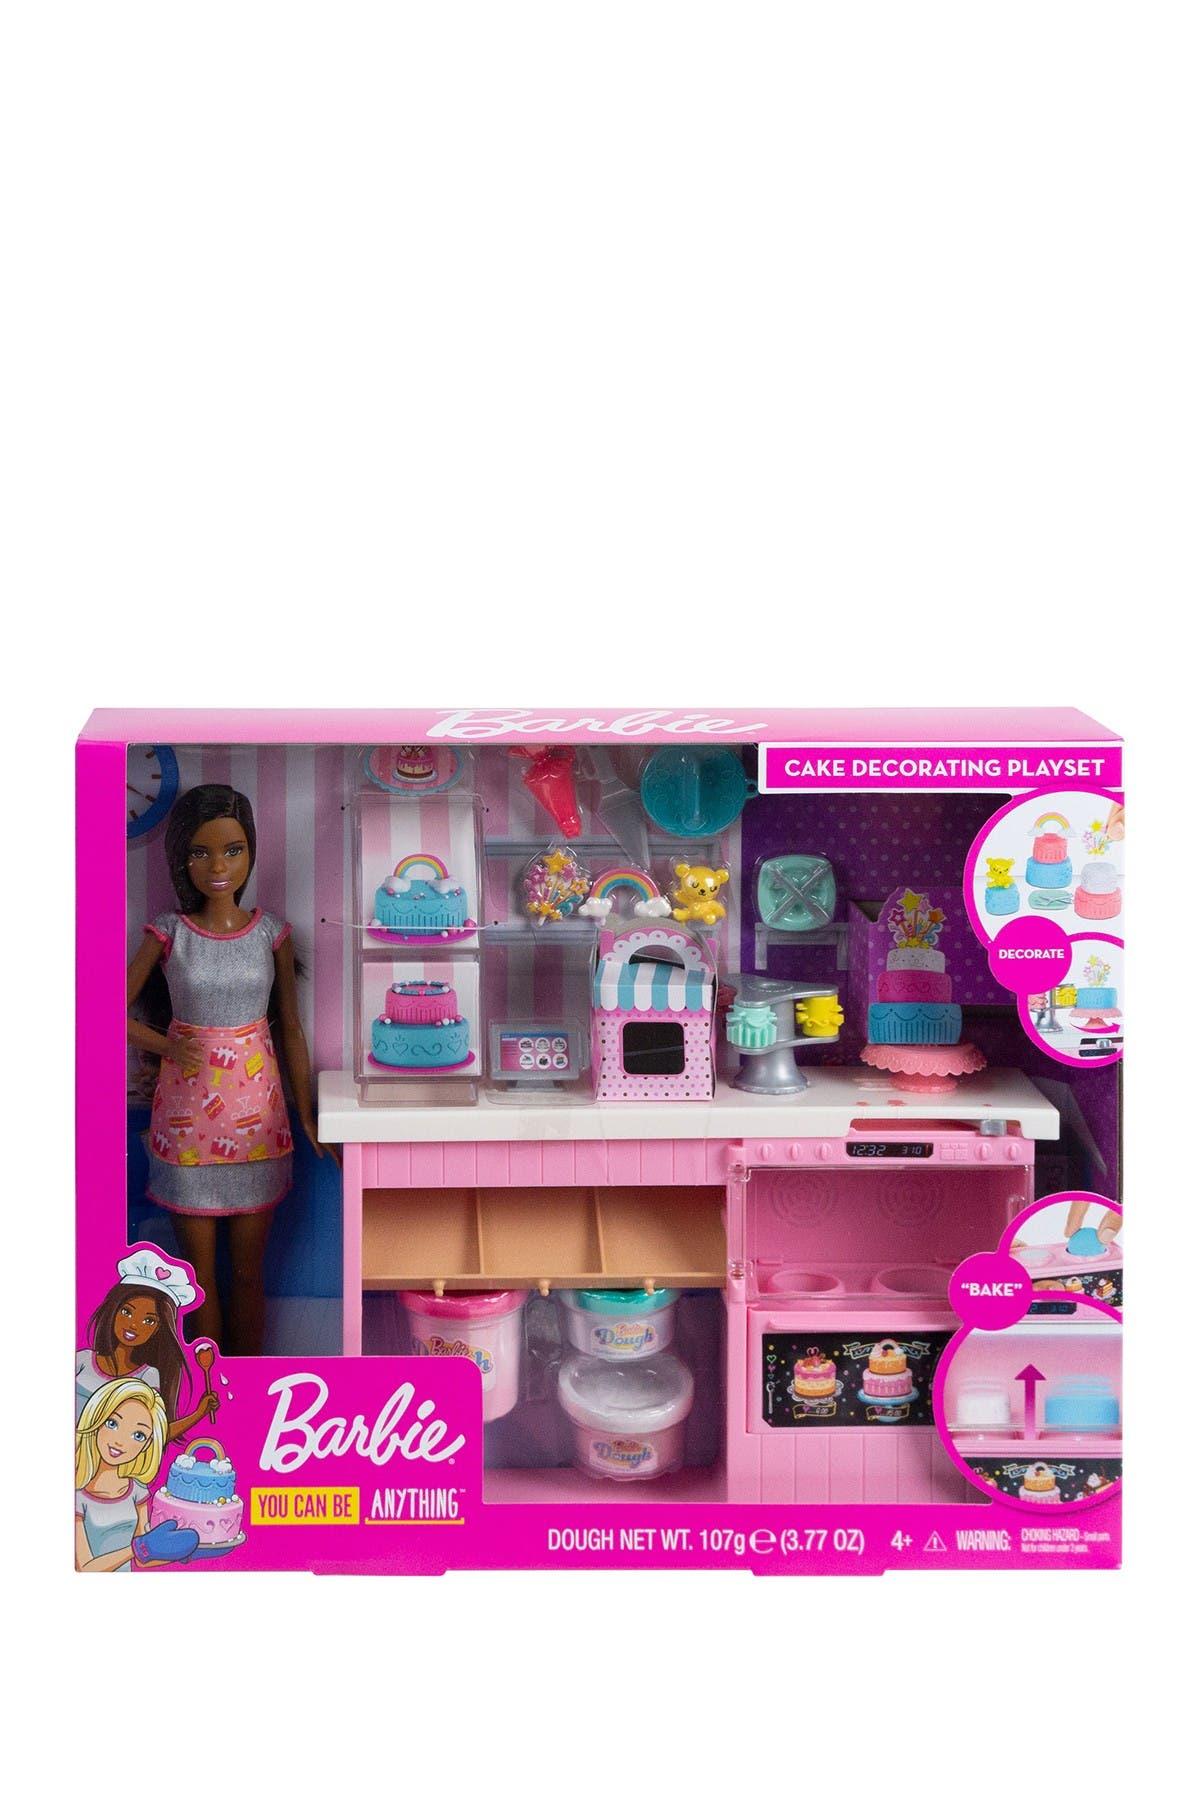 Mattel Barbie R Cake Decorating Playset Hautelook